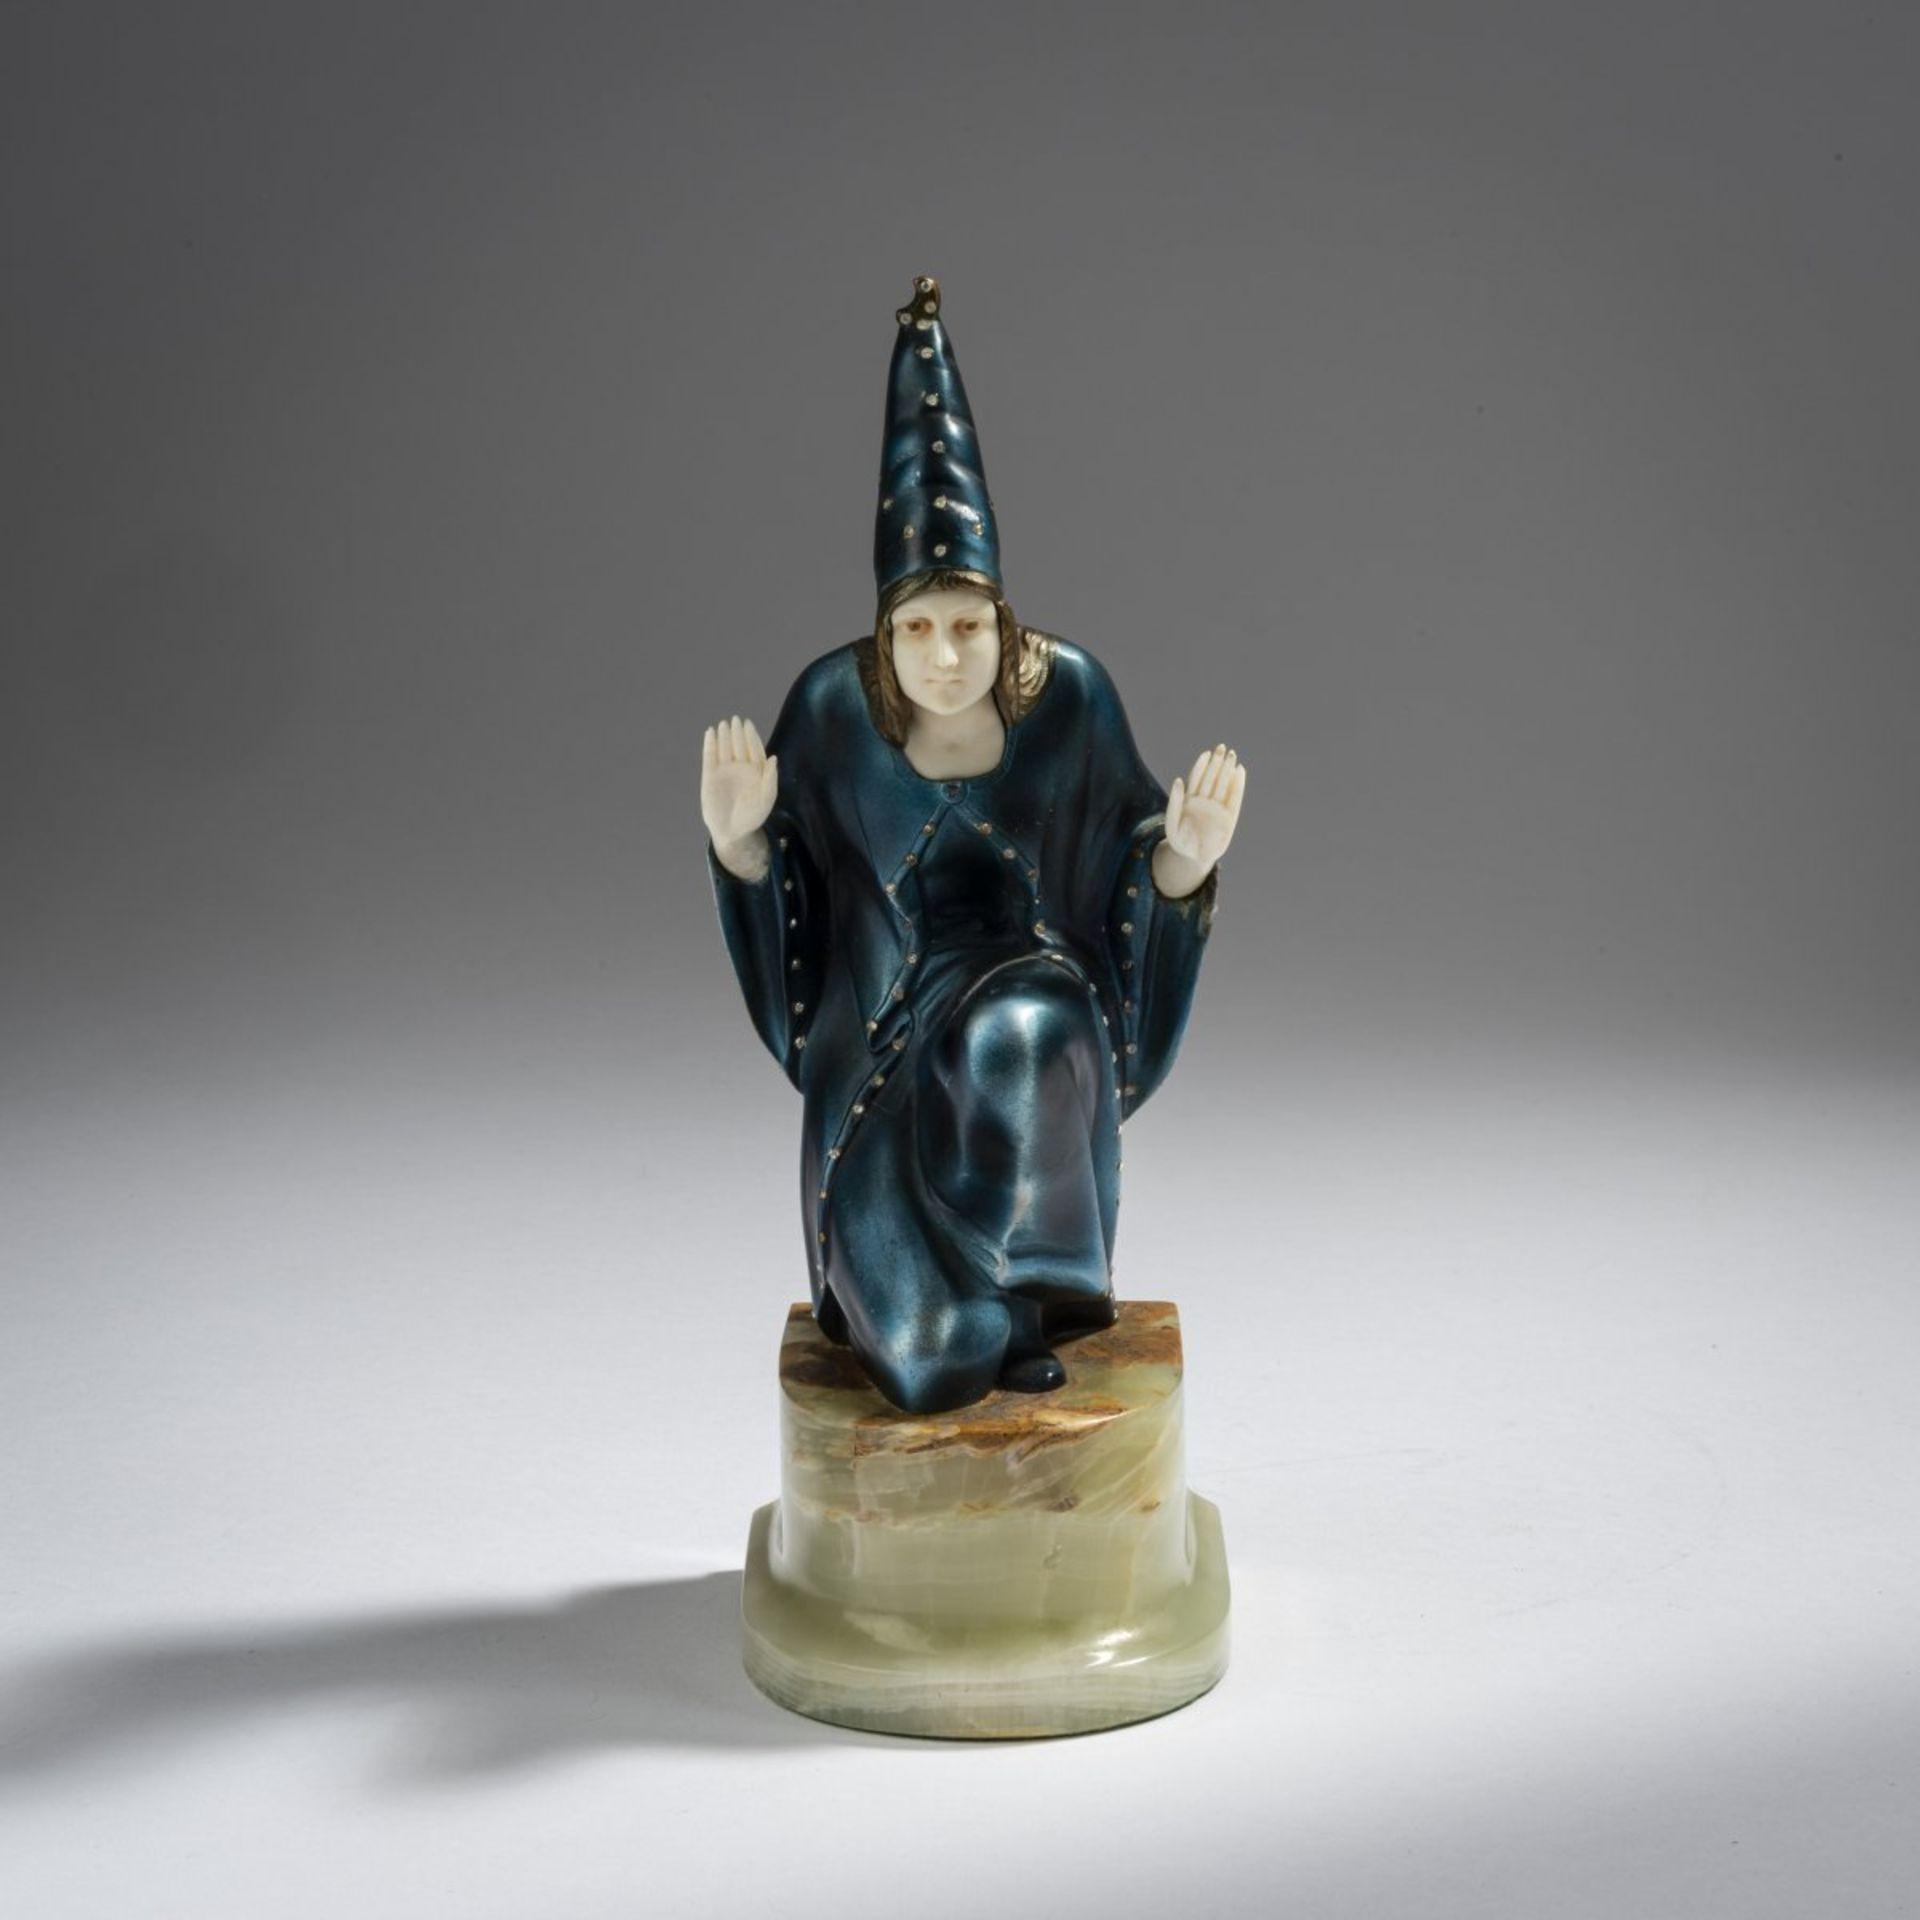 Franz Peleschka-Lunard, Zauberin, 1920er Jahre - Bild 2 aus 7